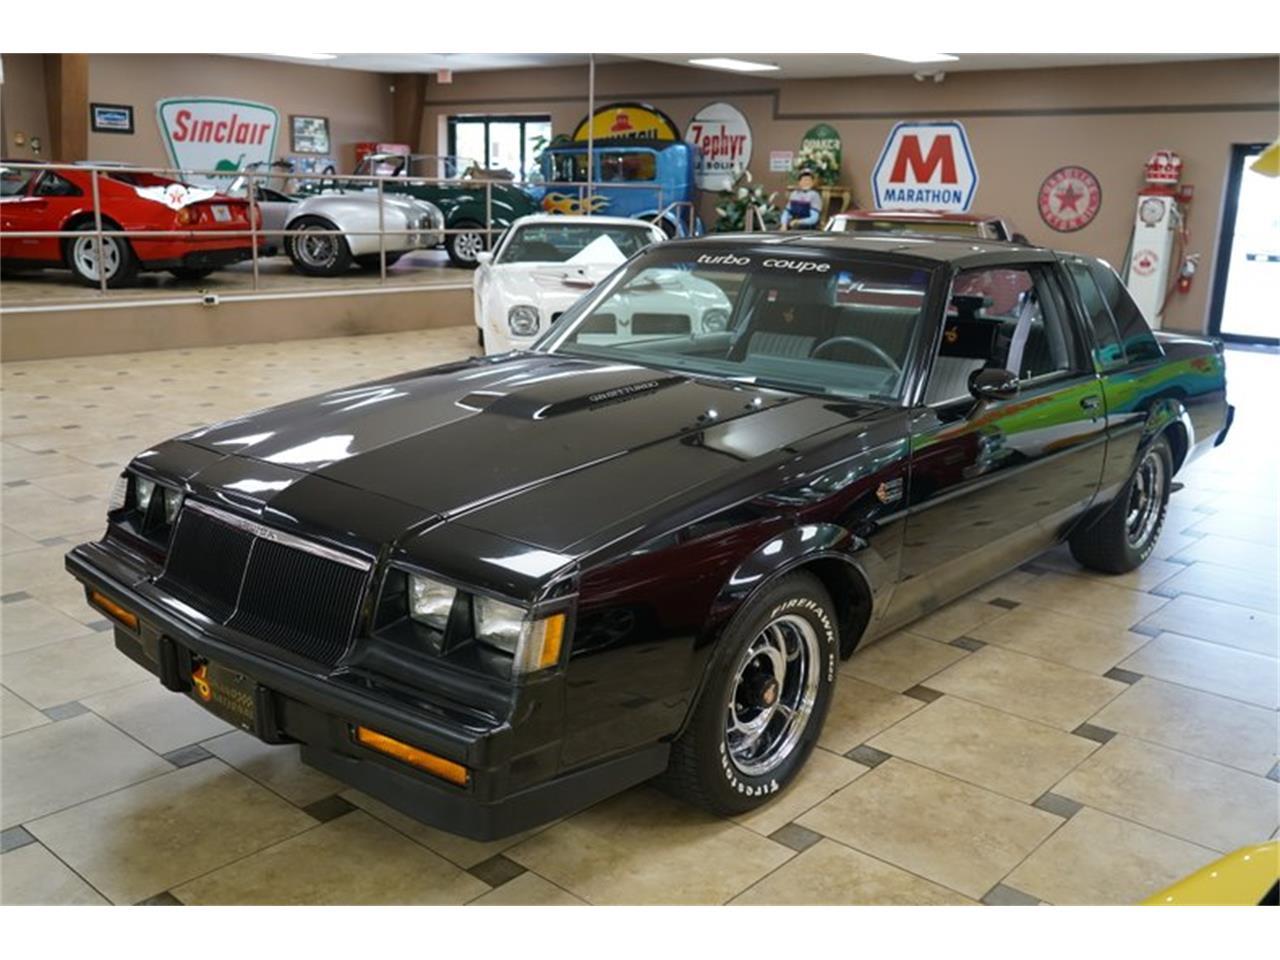 1986 Buick Regal >> 1986 Buick Regal For Sale Classiccars Com Cc 1204744